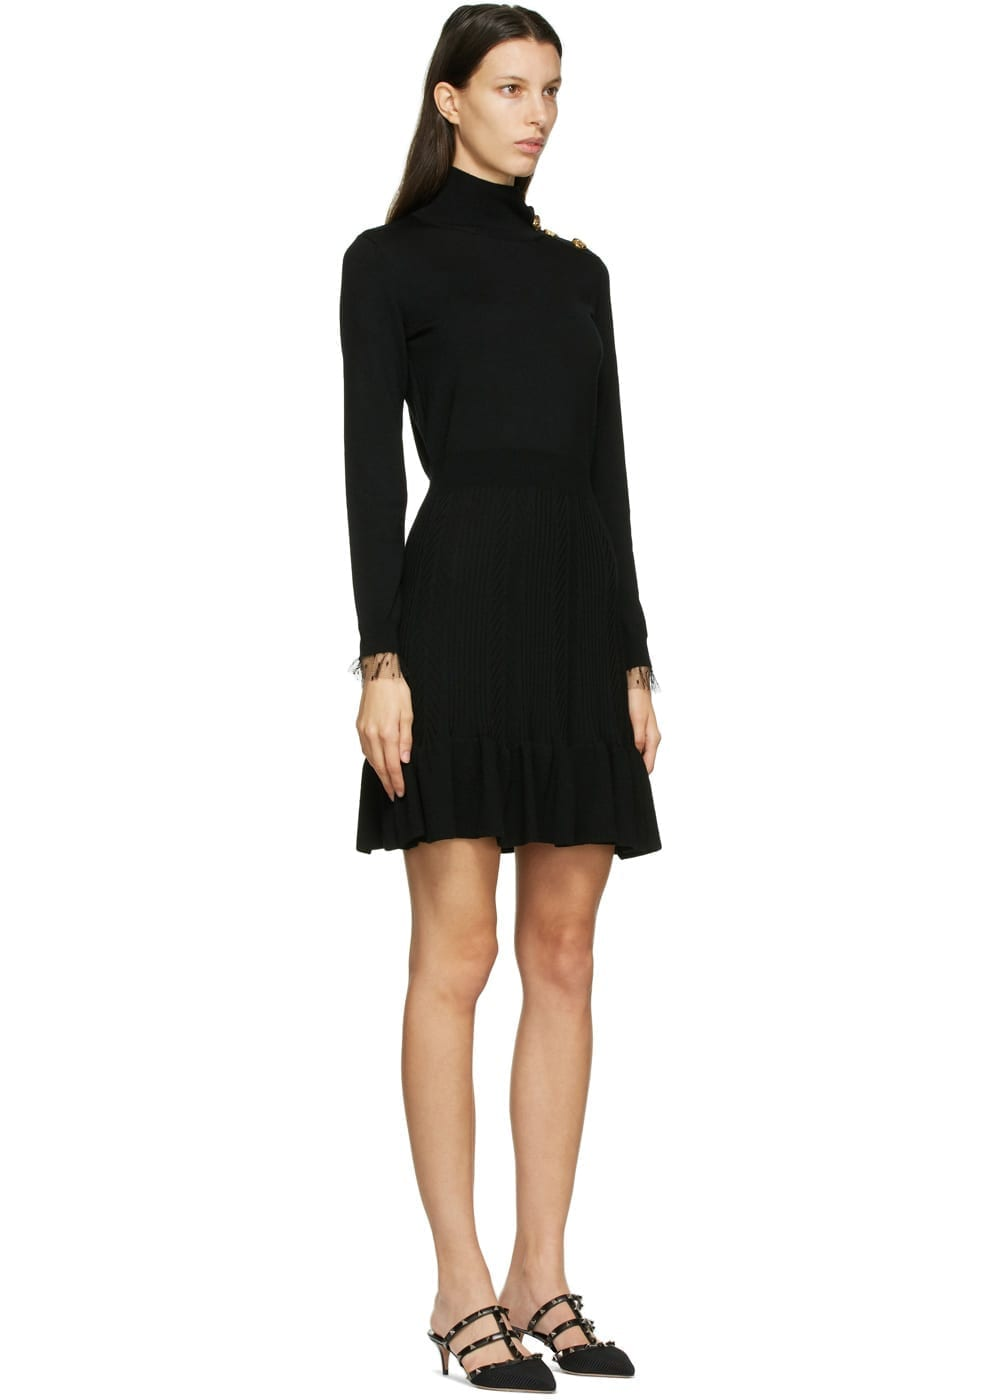 RED VALENTINO Black Virgin Wool Turtleneck Dress